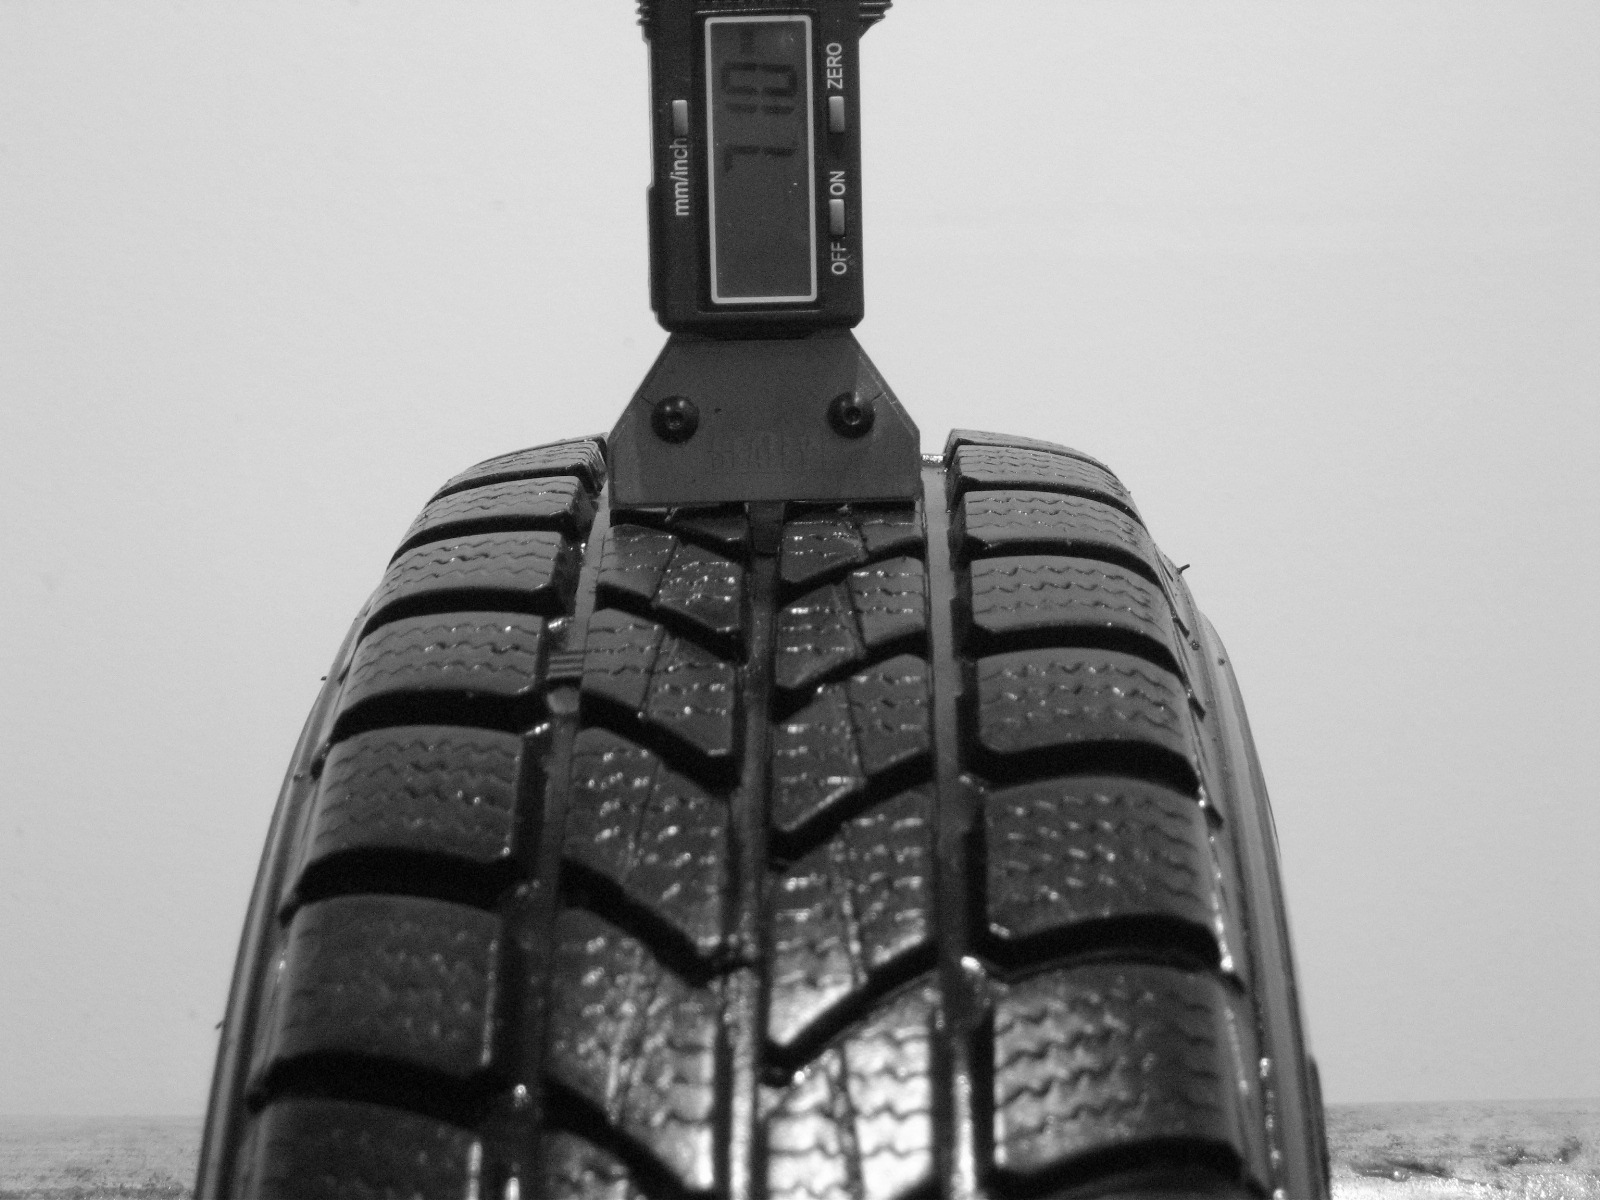 Použité-Pneu-Bazar - 145/80 R13 KINGSTAR WINTER SW40 -kusovka-rezerva 3mm